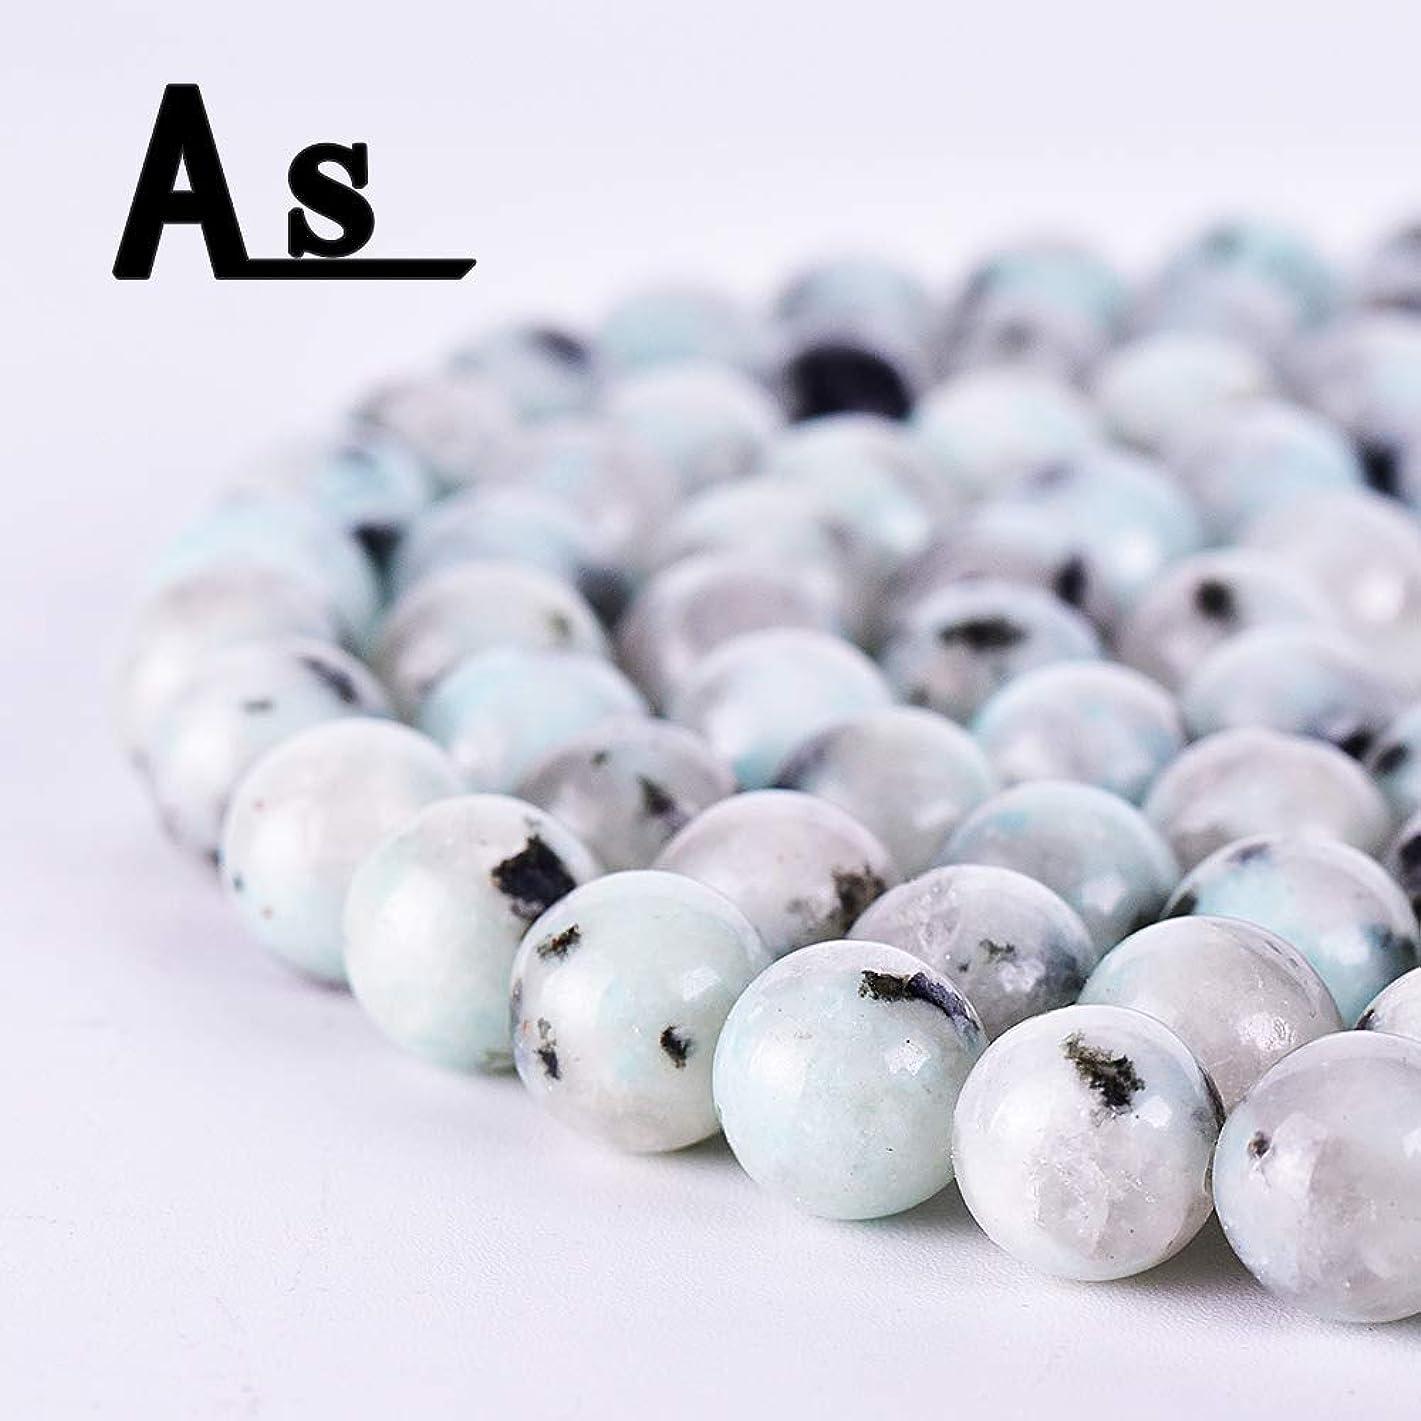 Asingeloo Natural 6mm Maoshan Jade Gemstones Smooth Round Stones Beads for Jewelry Making Crystal Energy Stone Healing Power 15